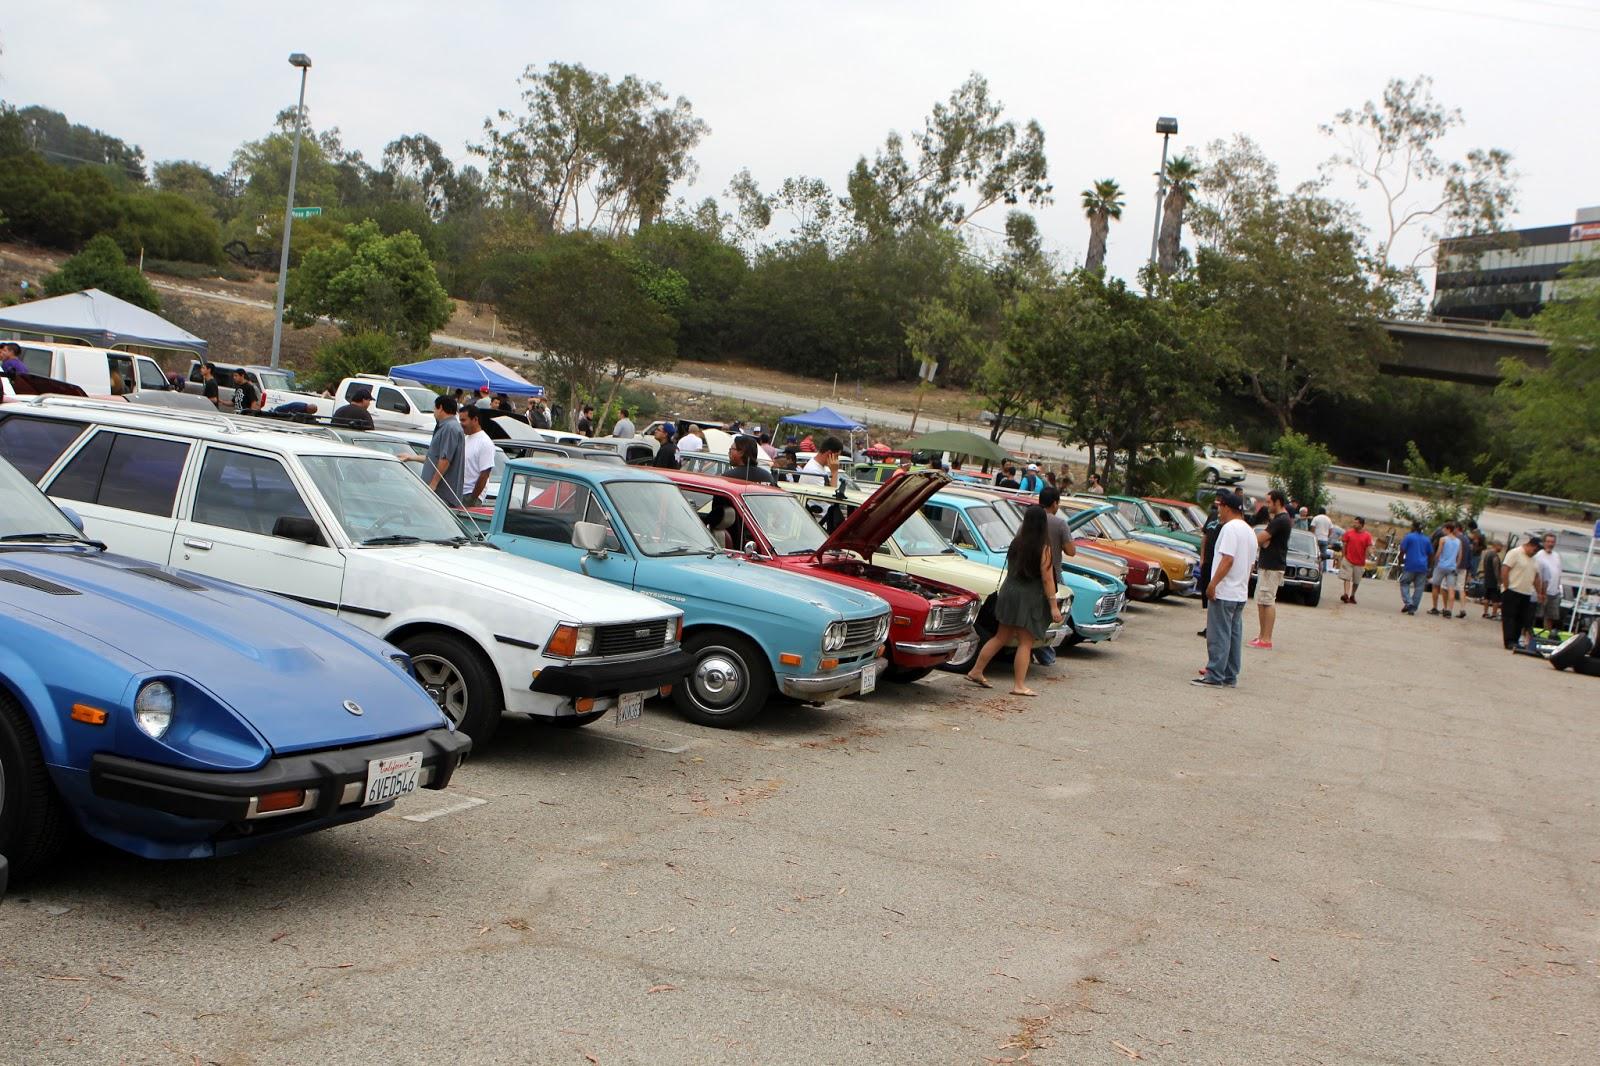 datsun nippon car show and swap meet